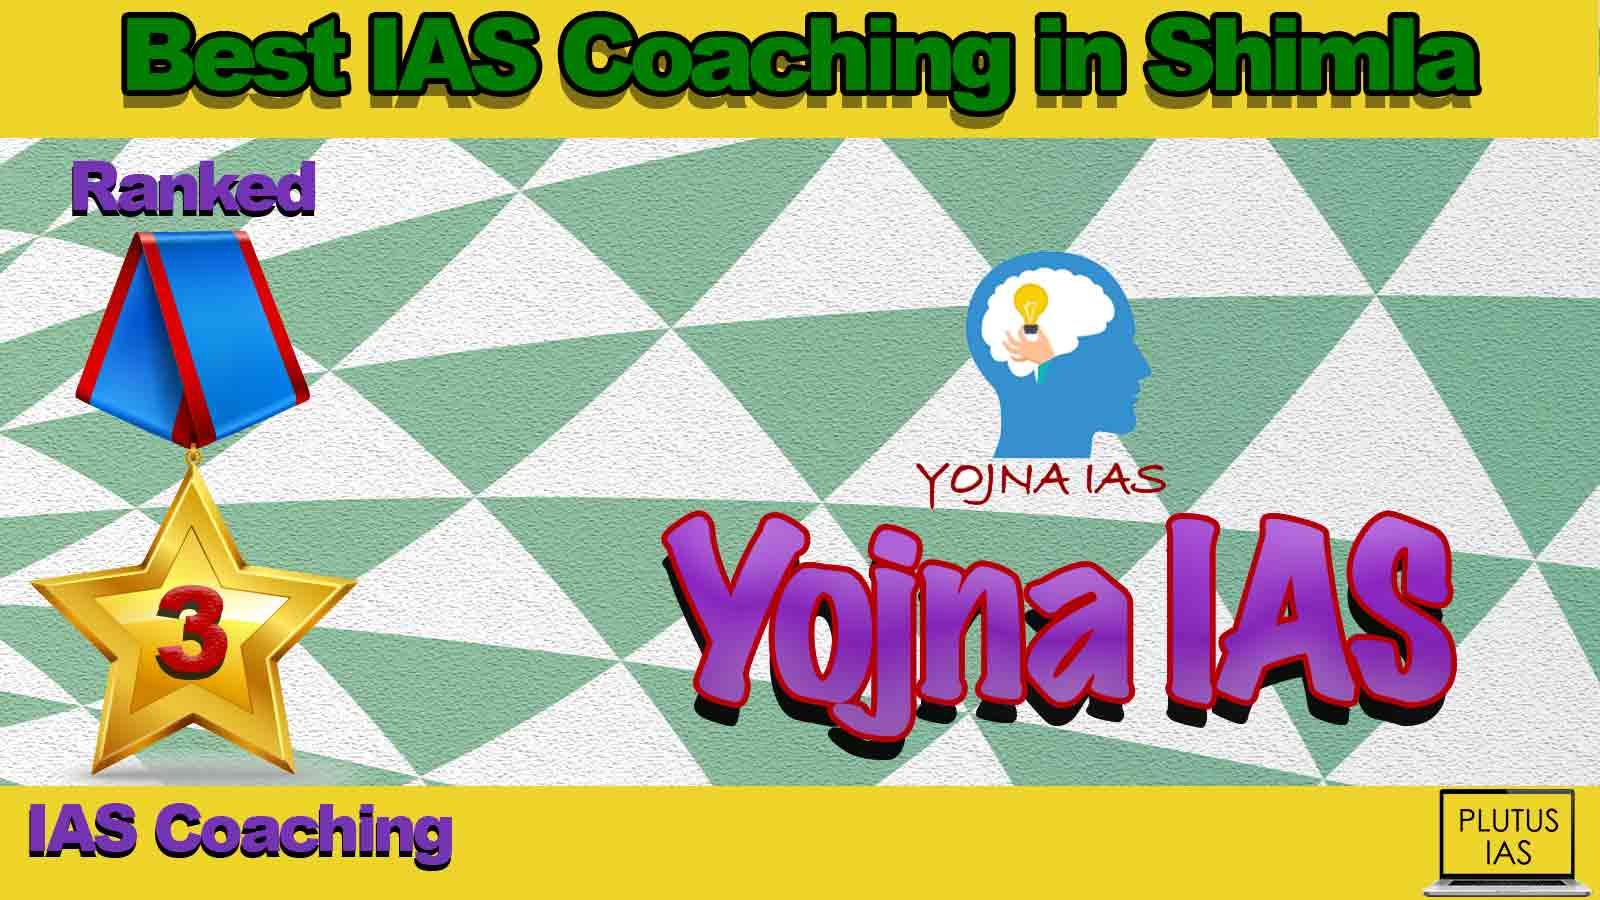 Best IAS Coaching in Shimla